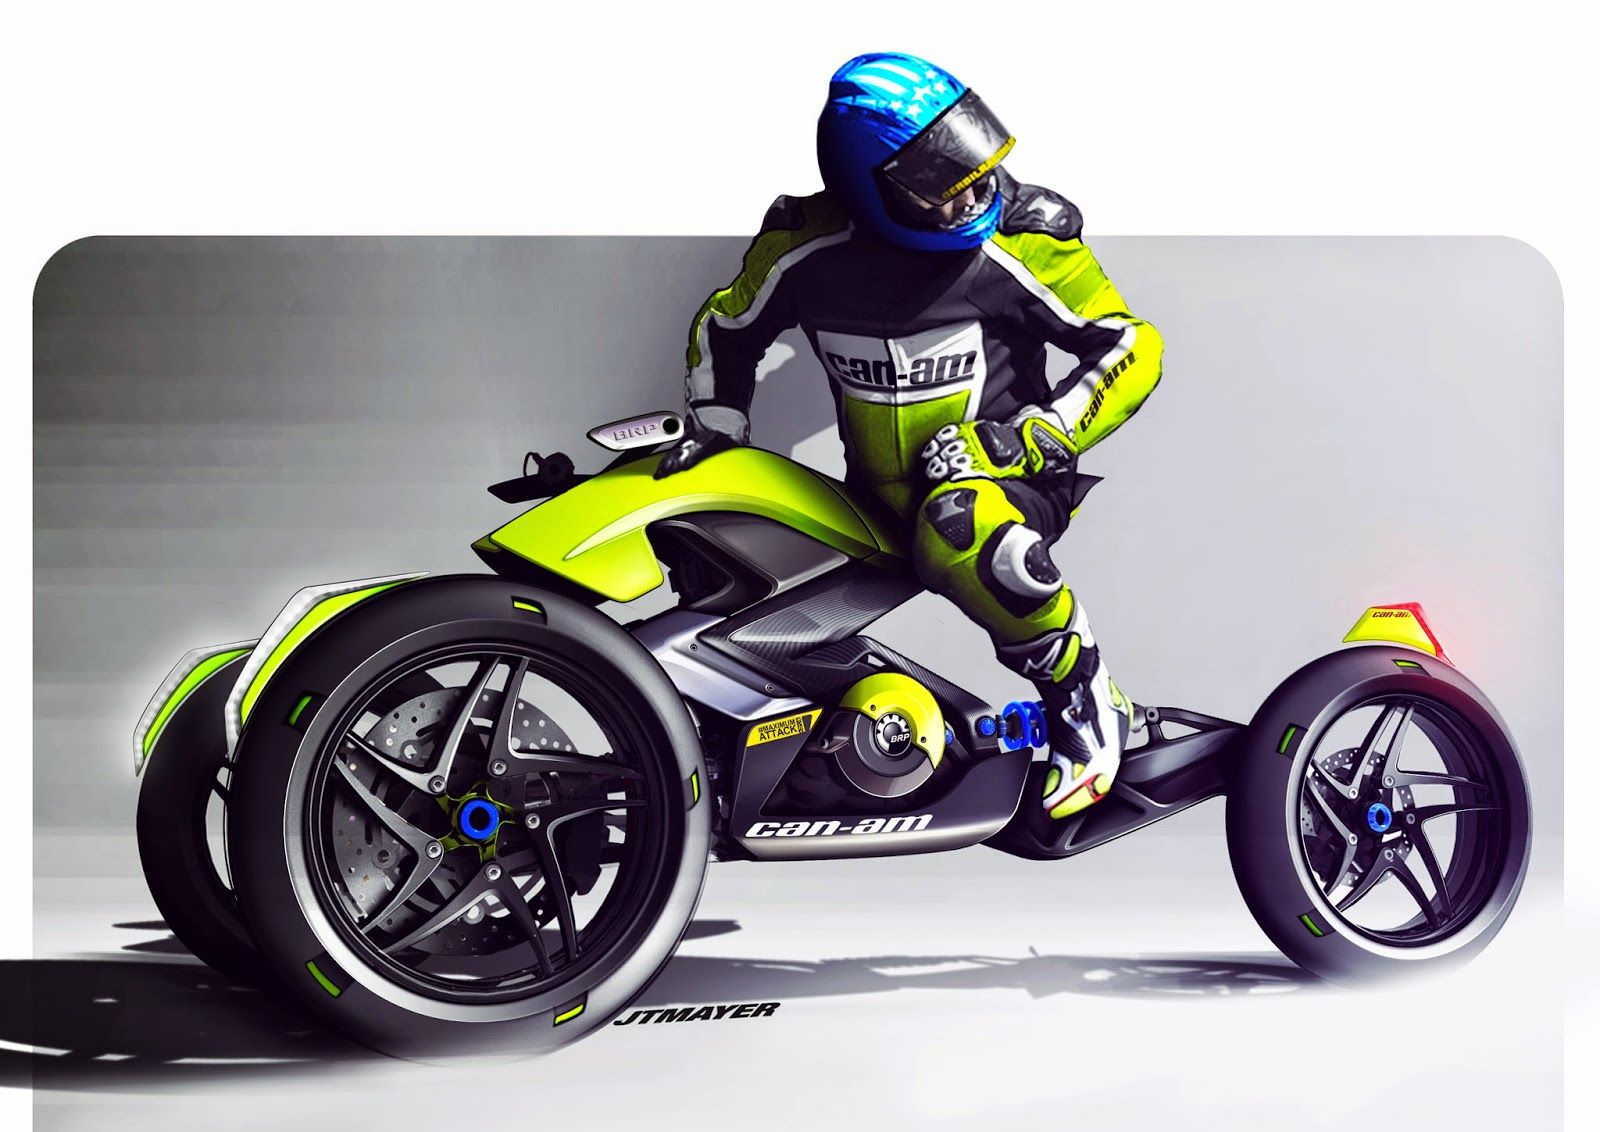 Epingle Par Alejandro Palacios Sur Motos Design Transport